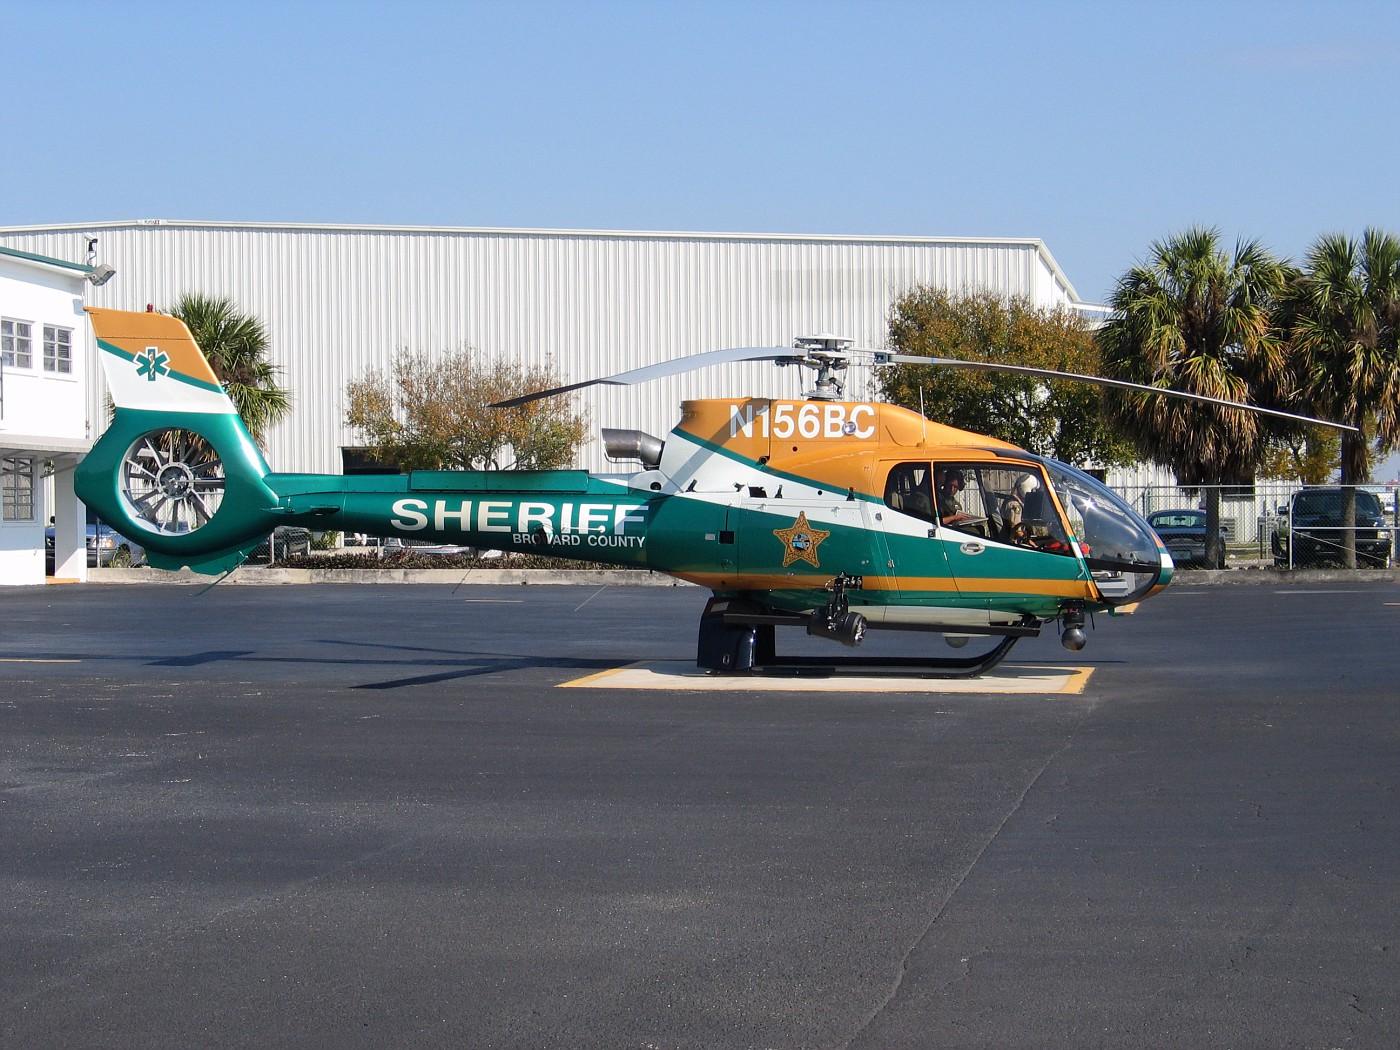 FL - Broward Co. Sheriff